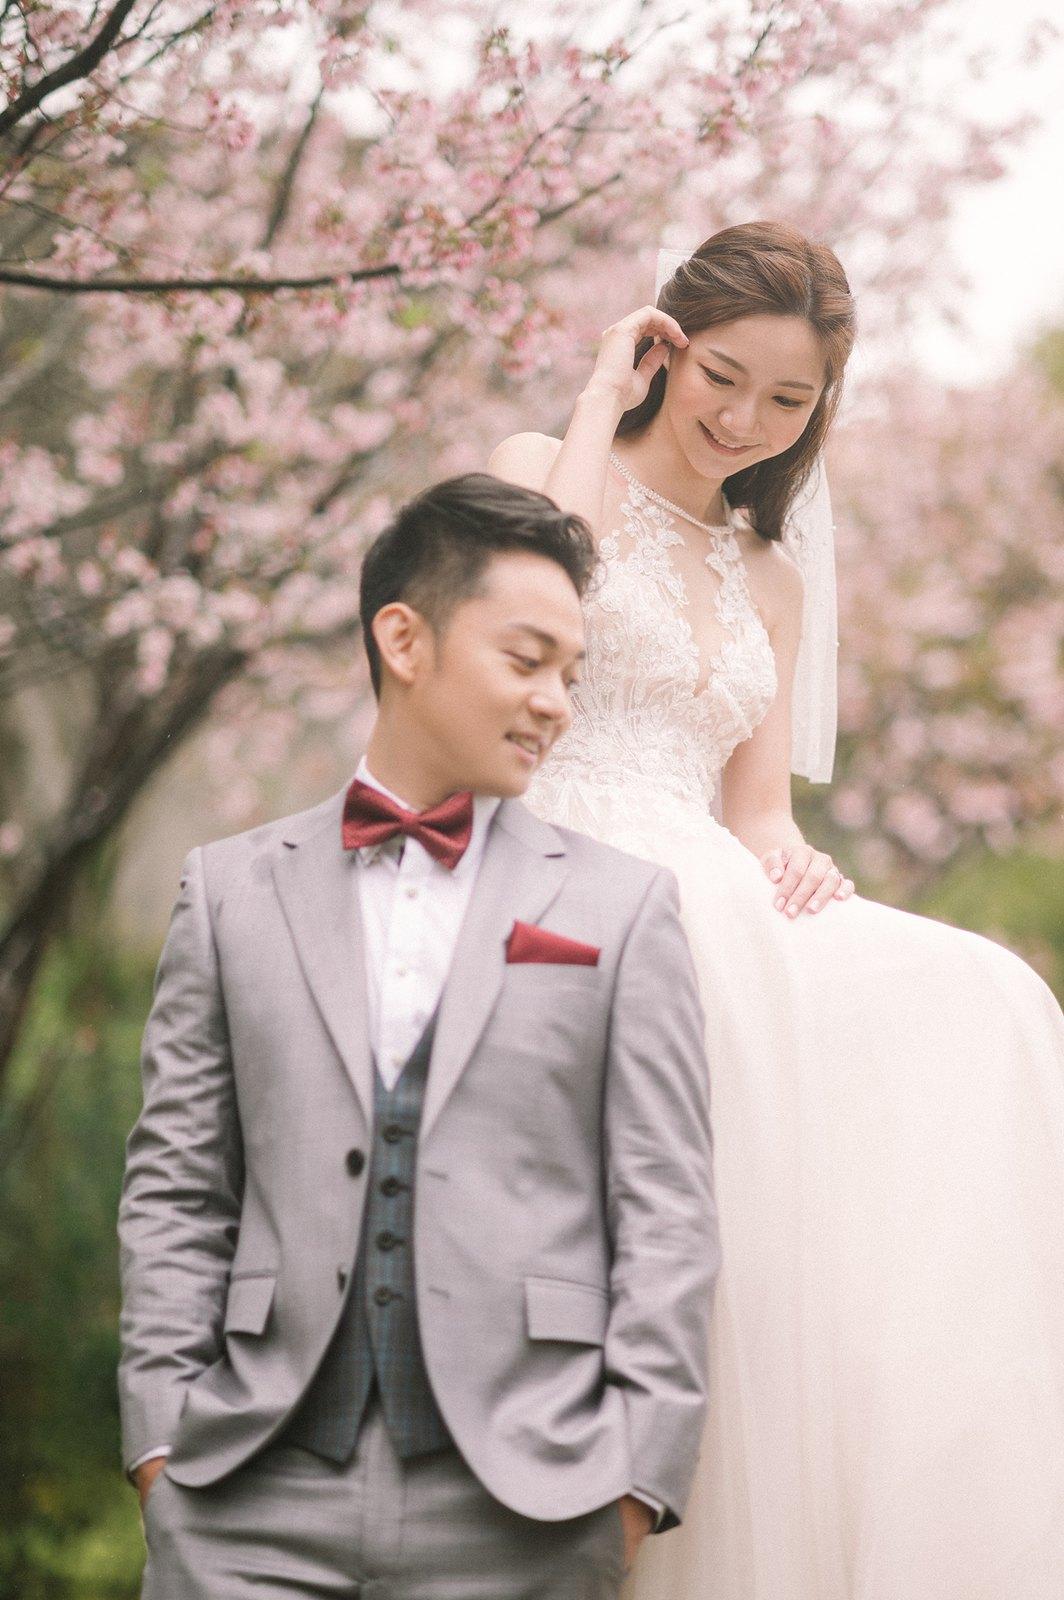 【婚紗】Cathleen & James / 陽明山 / EASTERN WEDDING studio / 華中河濱公園